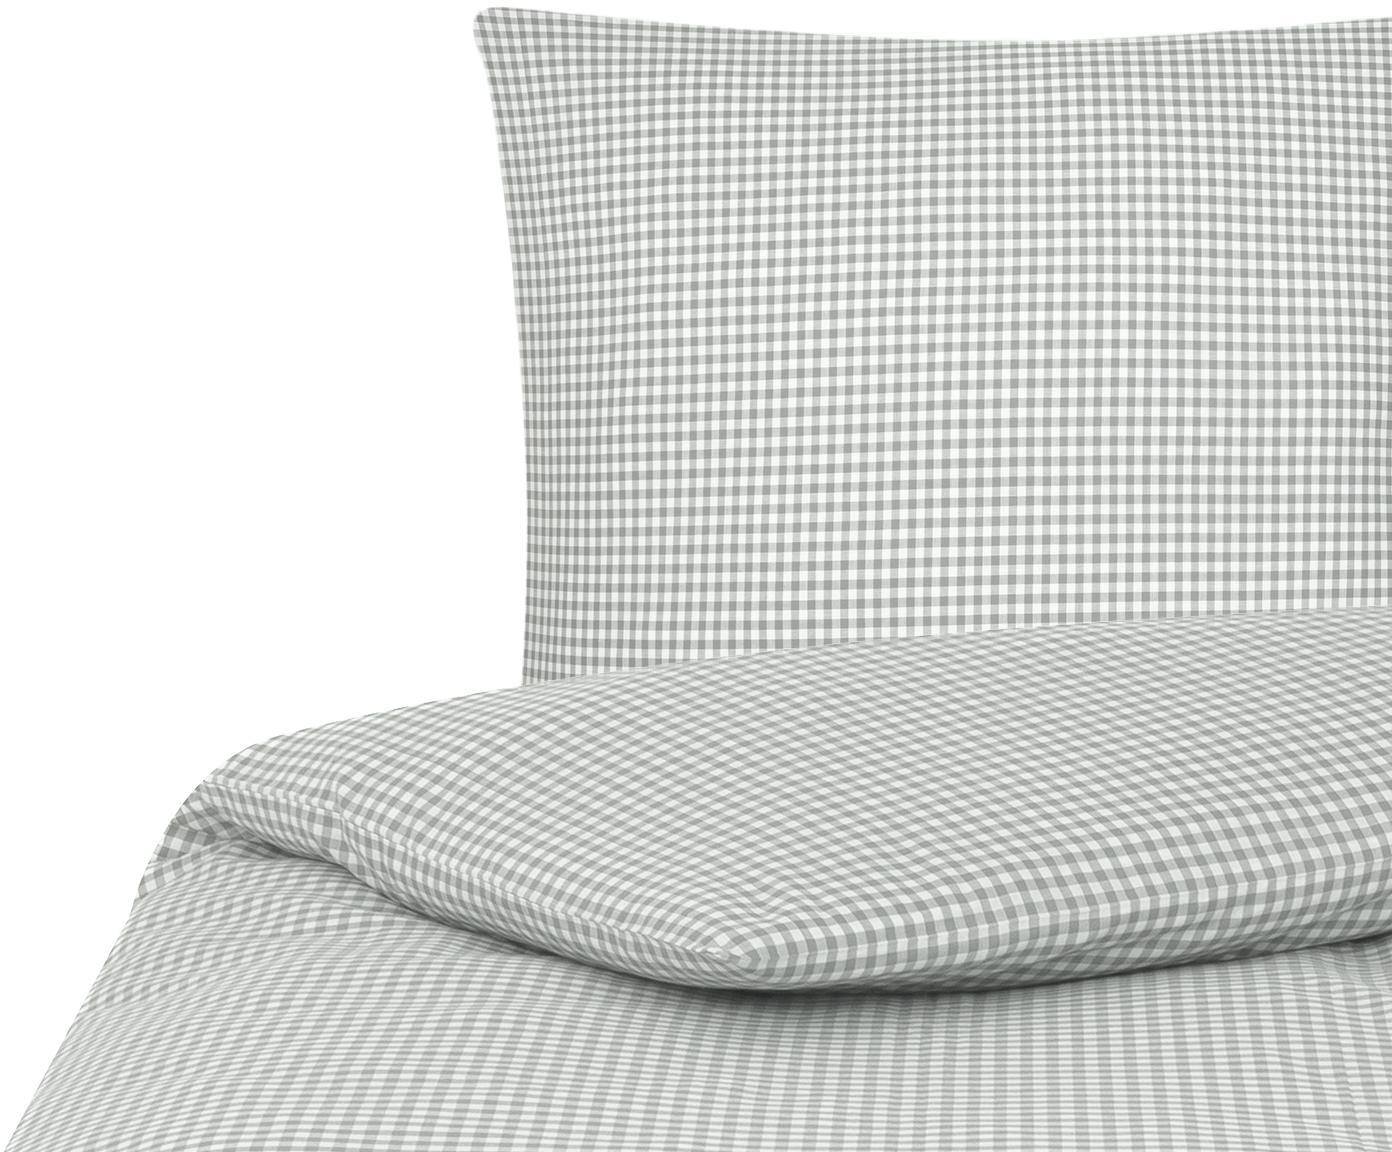 Katoenen dekbedovertrek Scotty, Katoen, Lichtgrijs/wit, 140 x 200 cm